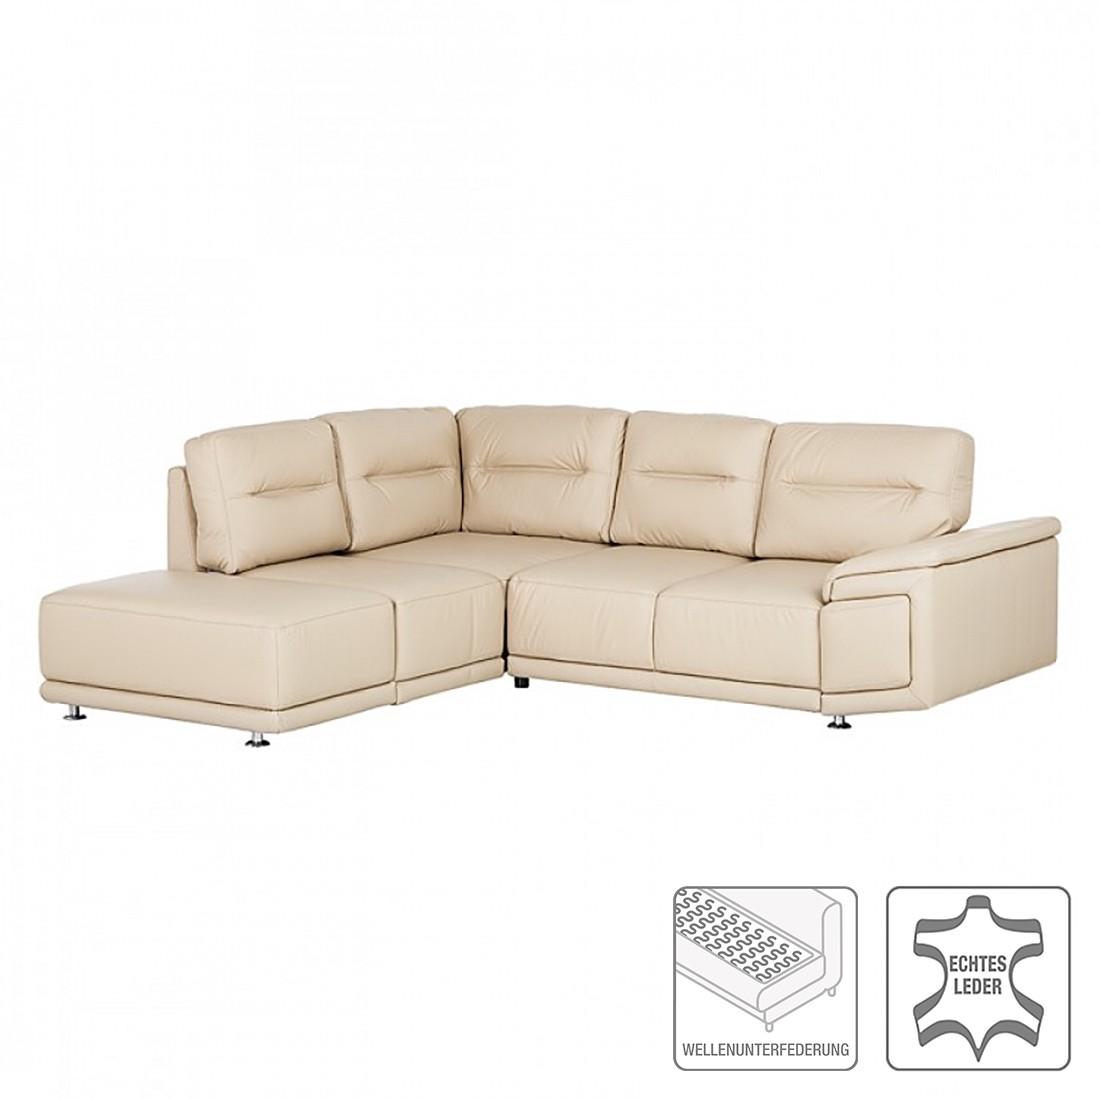 ecksofa torino mit schlaffunktion echtleder beige ottomane davorstehend links nuovoform. Black Bedroom Furniture Sets. Home Design Ideas